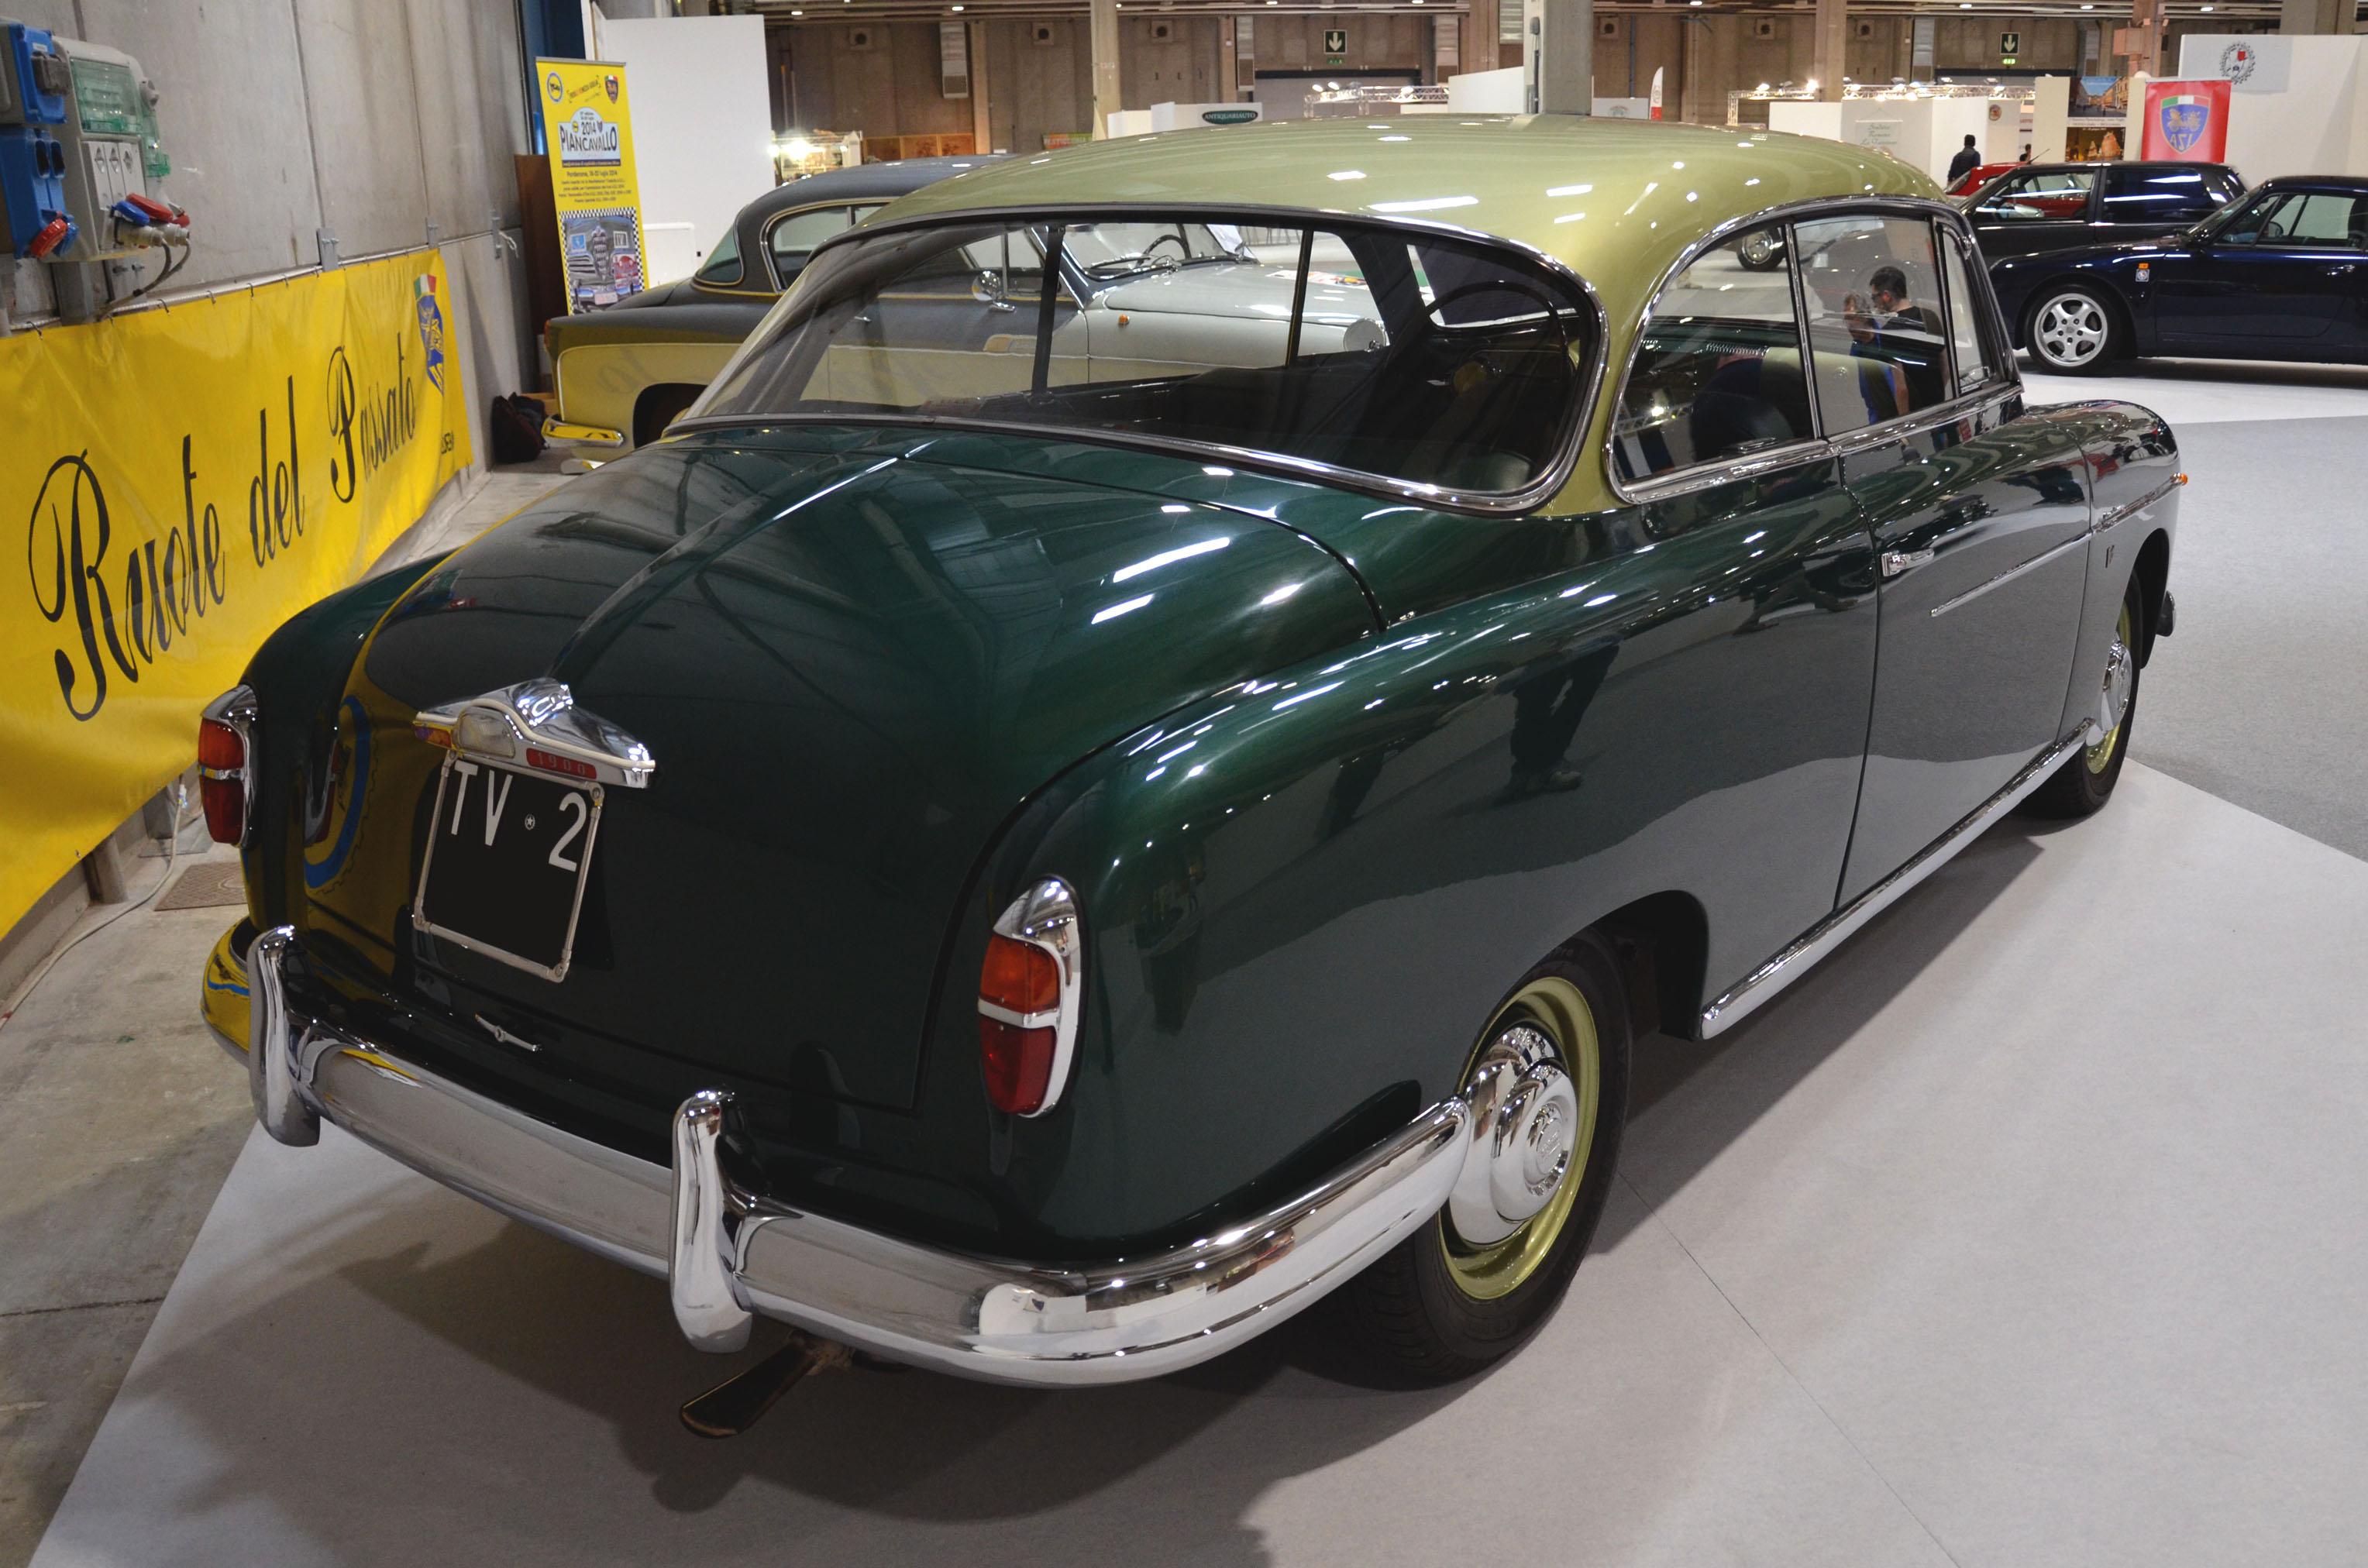 File:Fiat 1900 Granluce - Legend Cars 2015 JPG - Wikimedia Commons